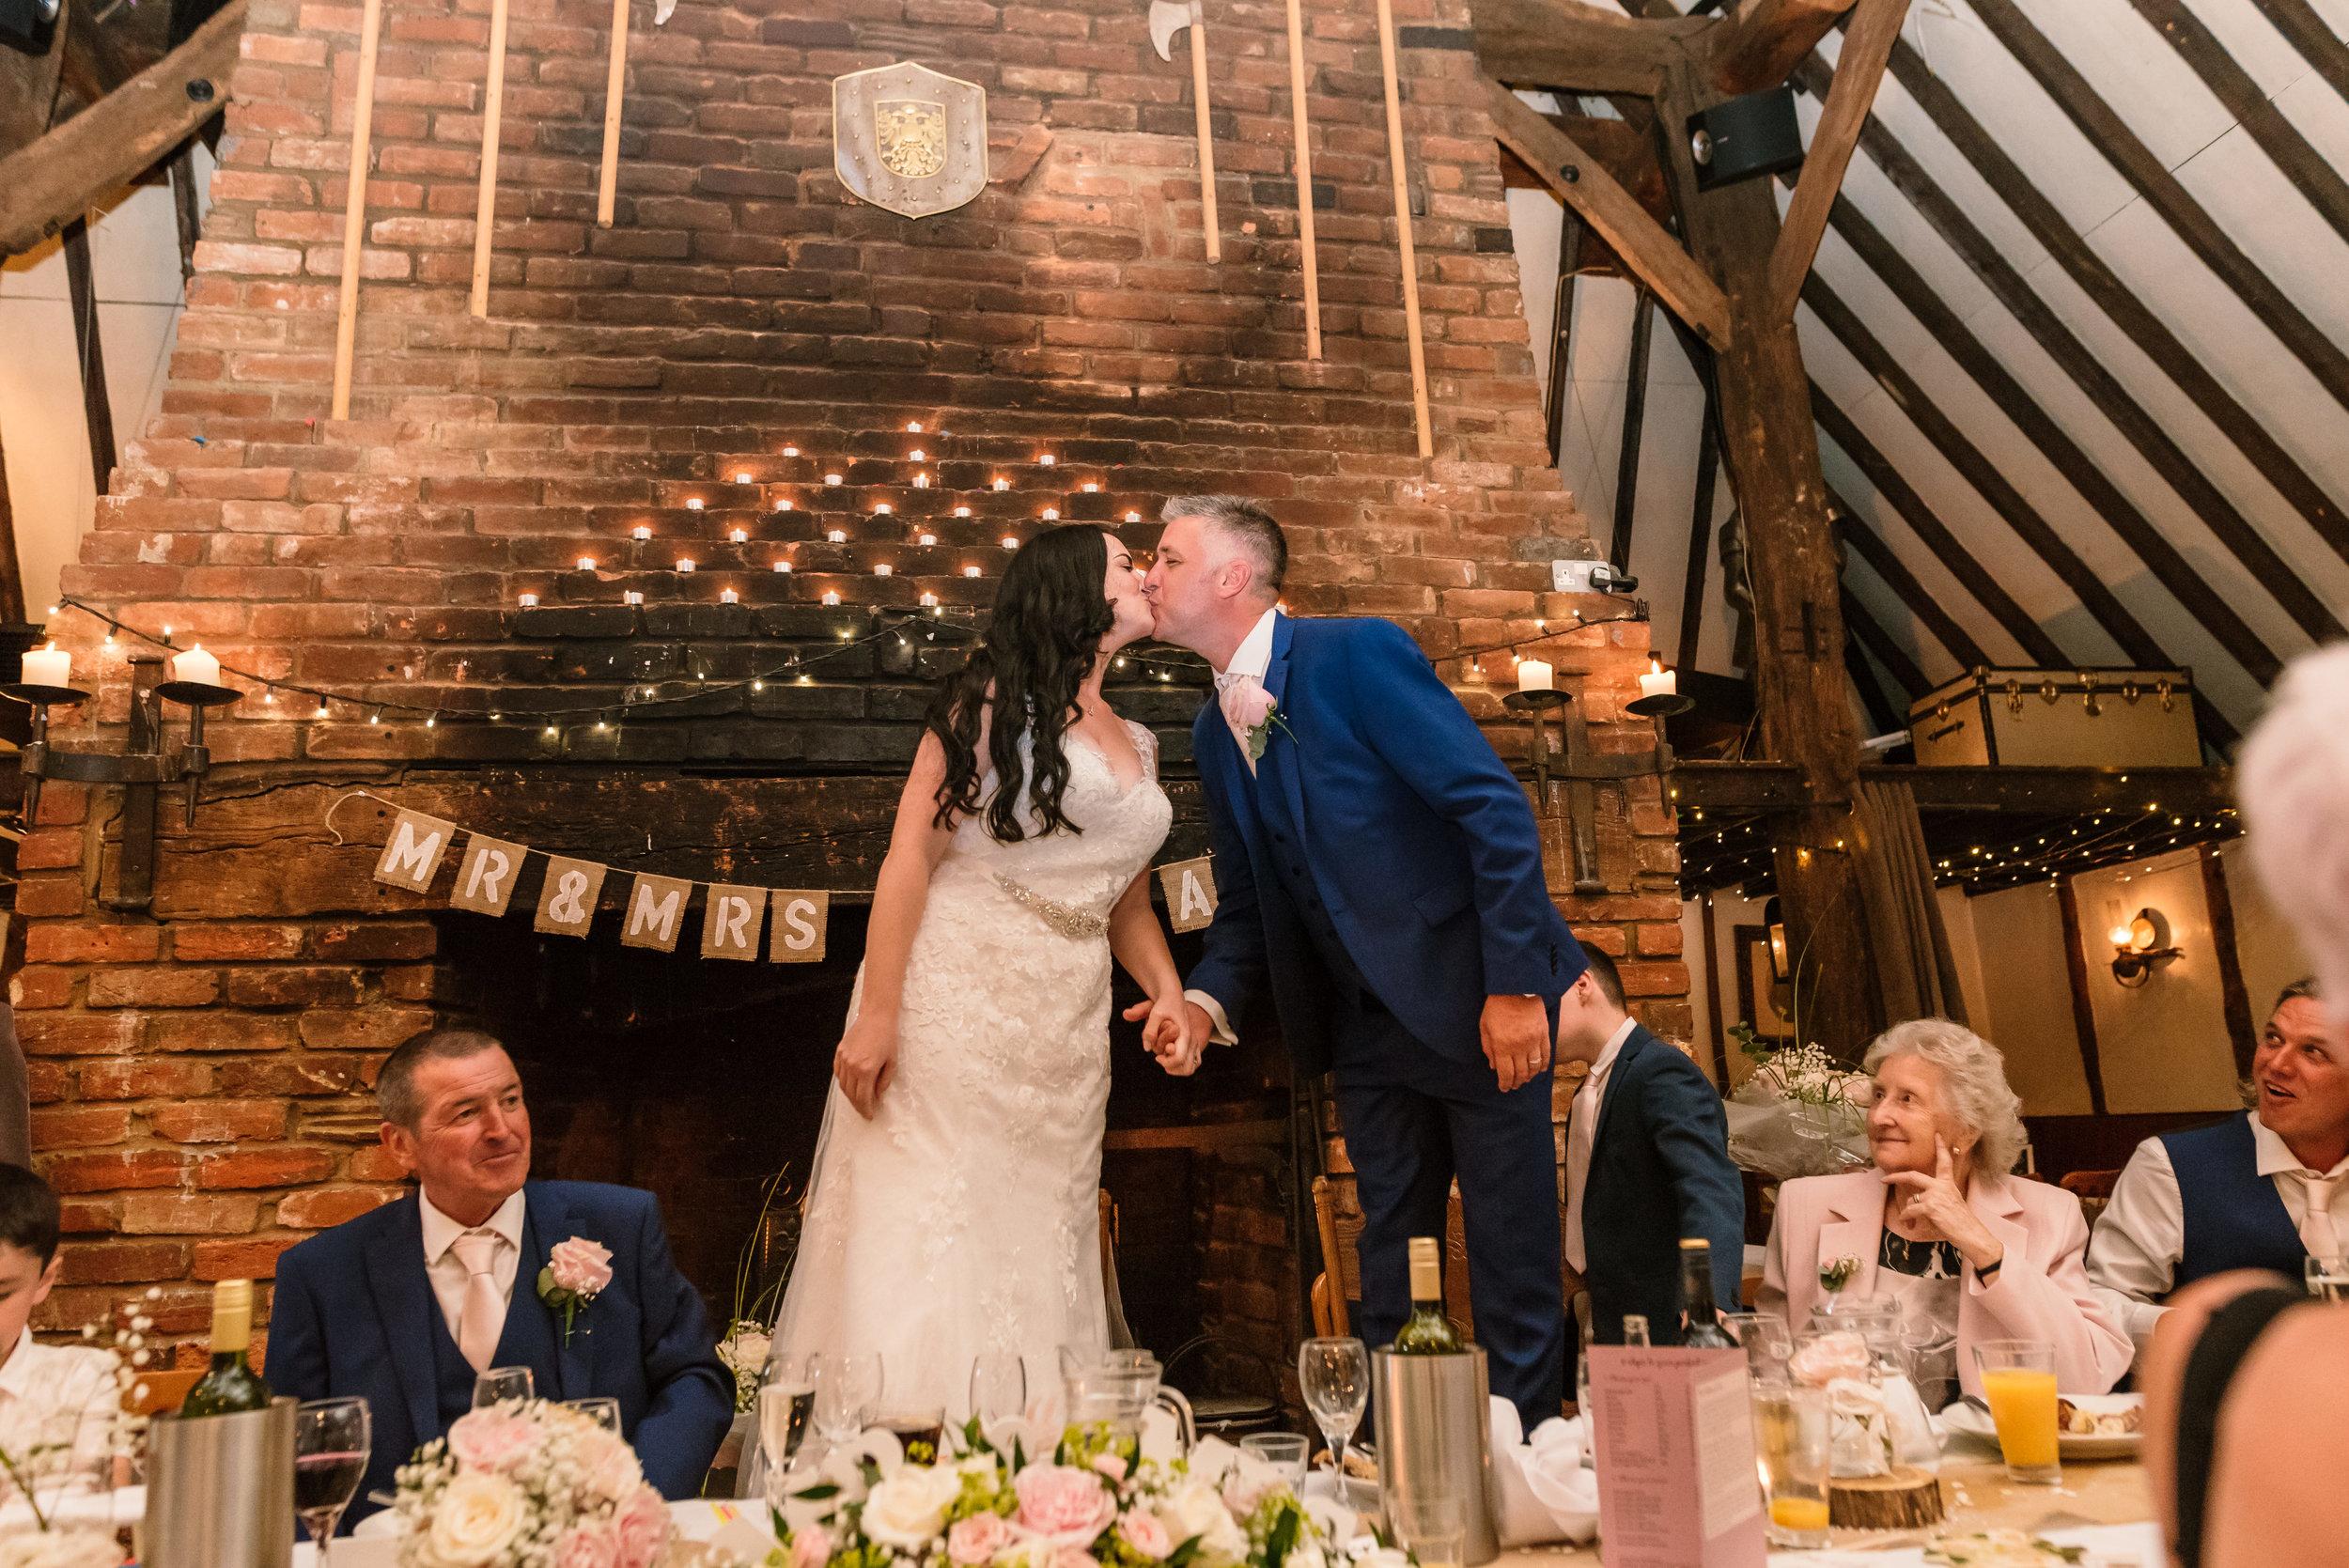 Sarah-Fishlock-Photography : Hampshire-wedding-photographer-hampshire : fleet-wedding-photographer-fleet : Meade-Hall-Wedding-Photographer : Meade-Hall-Wedding-Photos-956.jpg